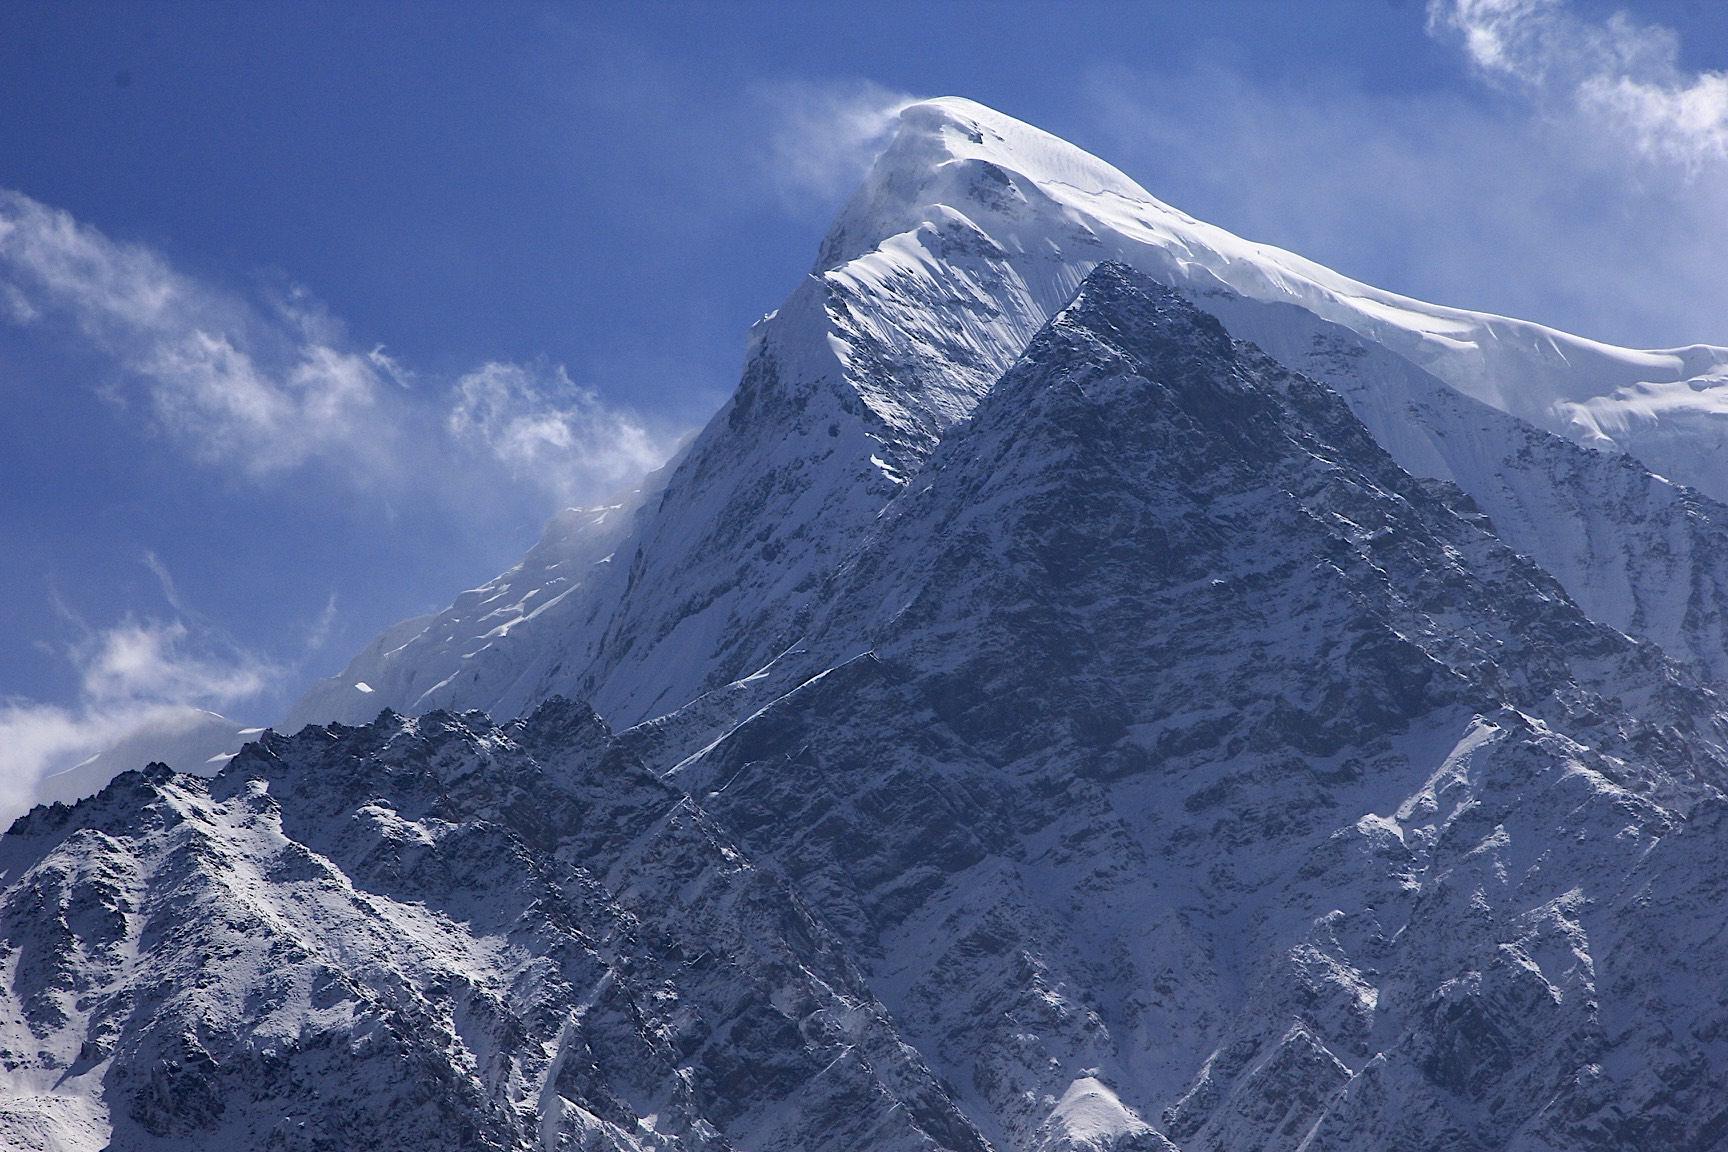 Nilgiri Peak - part of the Annapurna massif